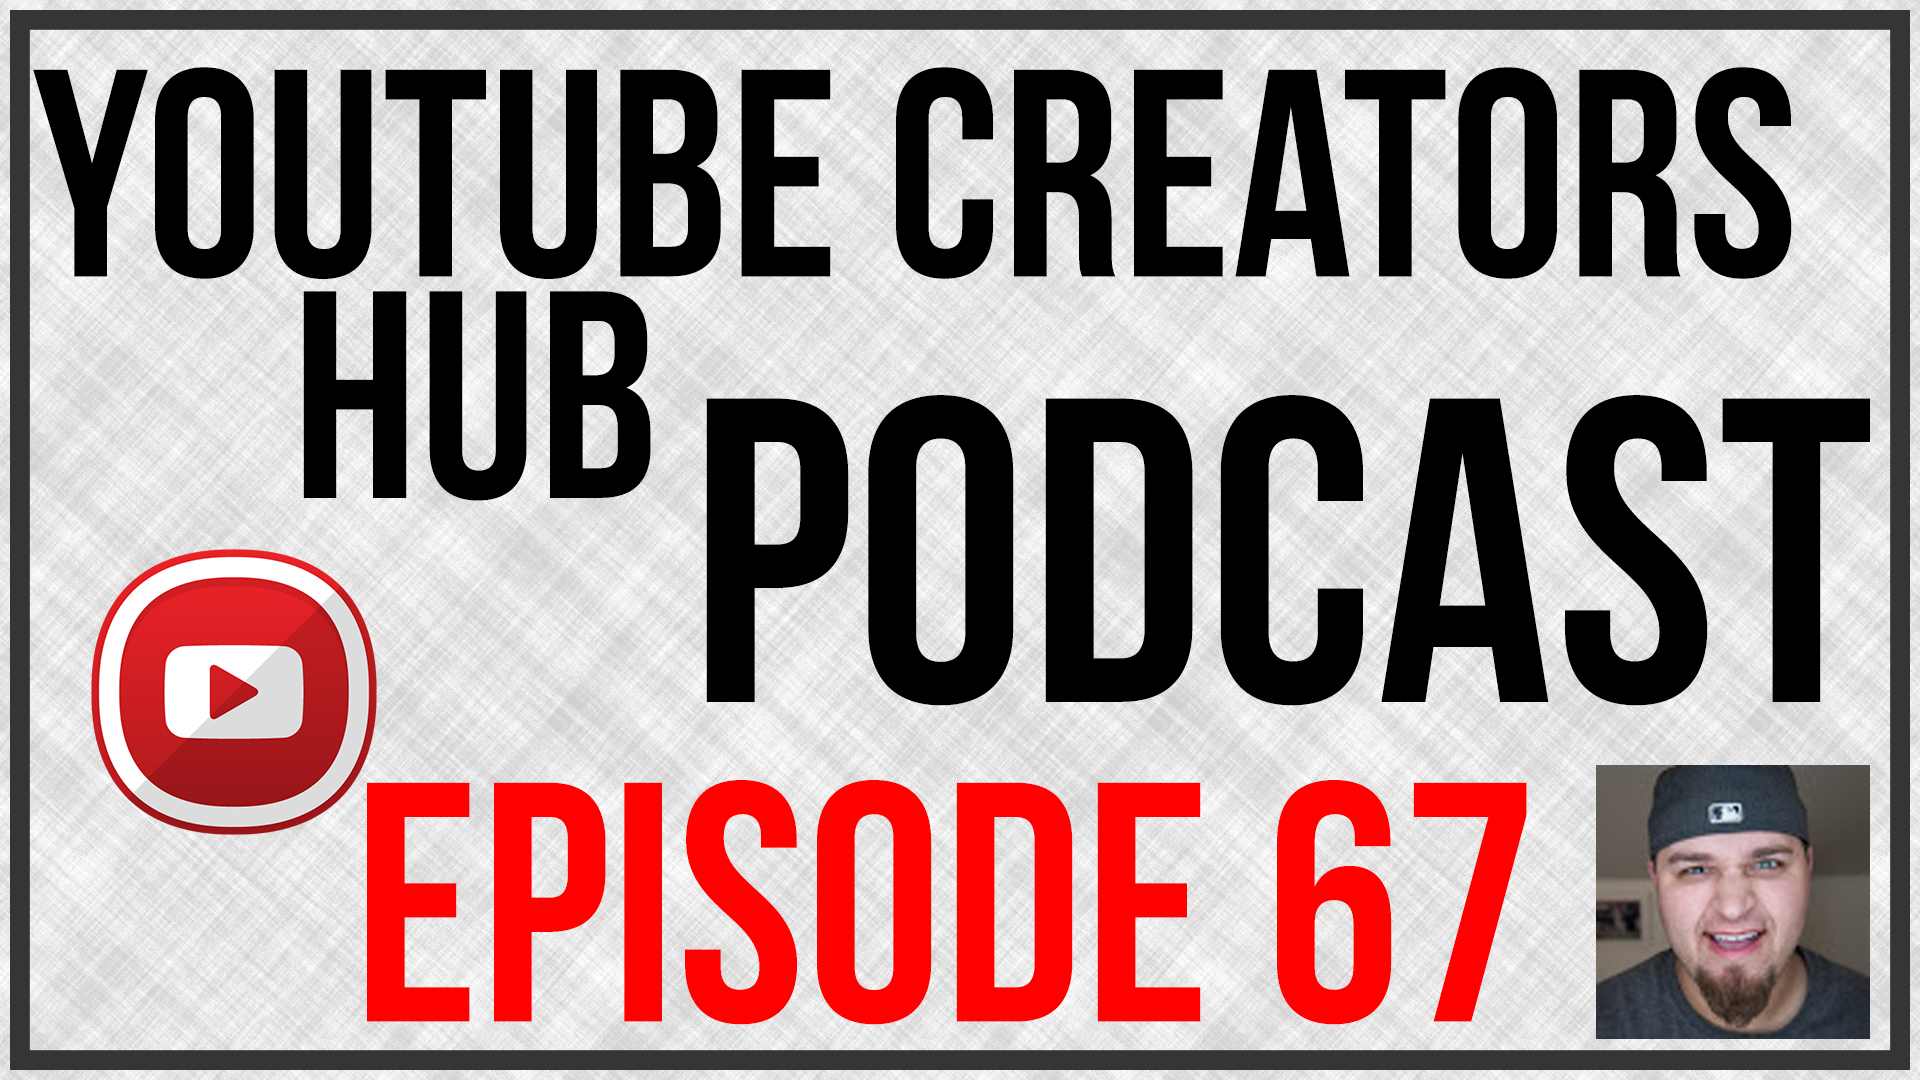 youtube creators hub podcast episode 67